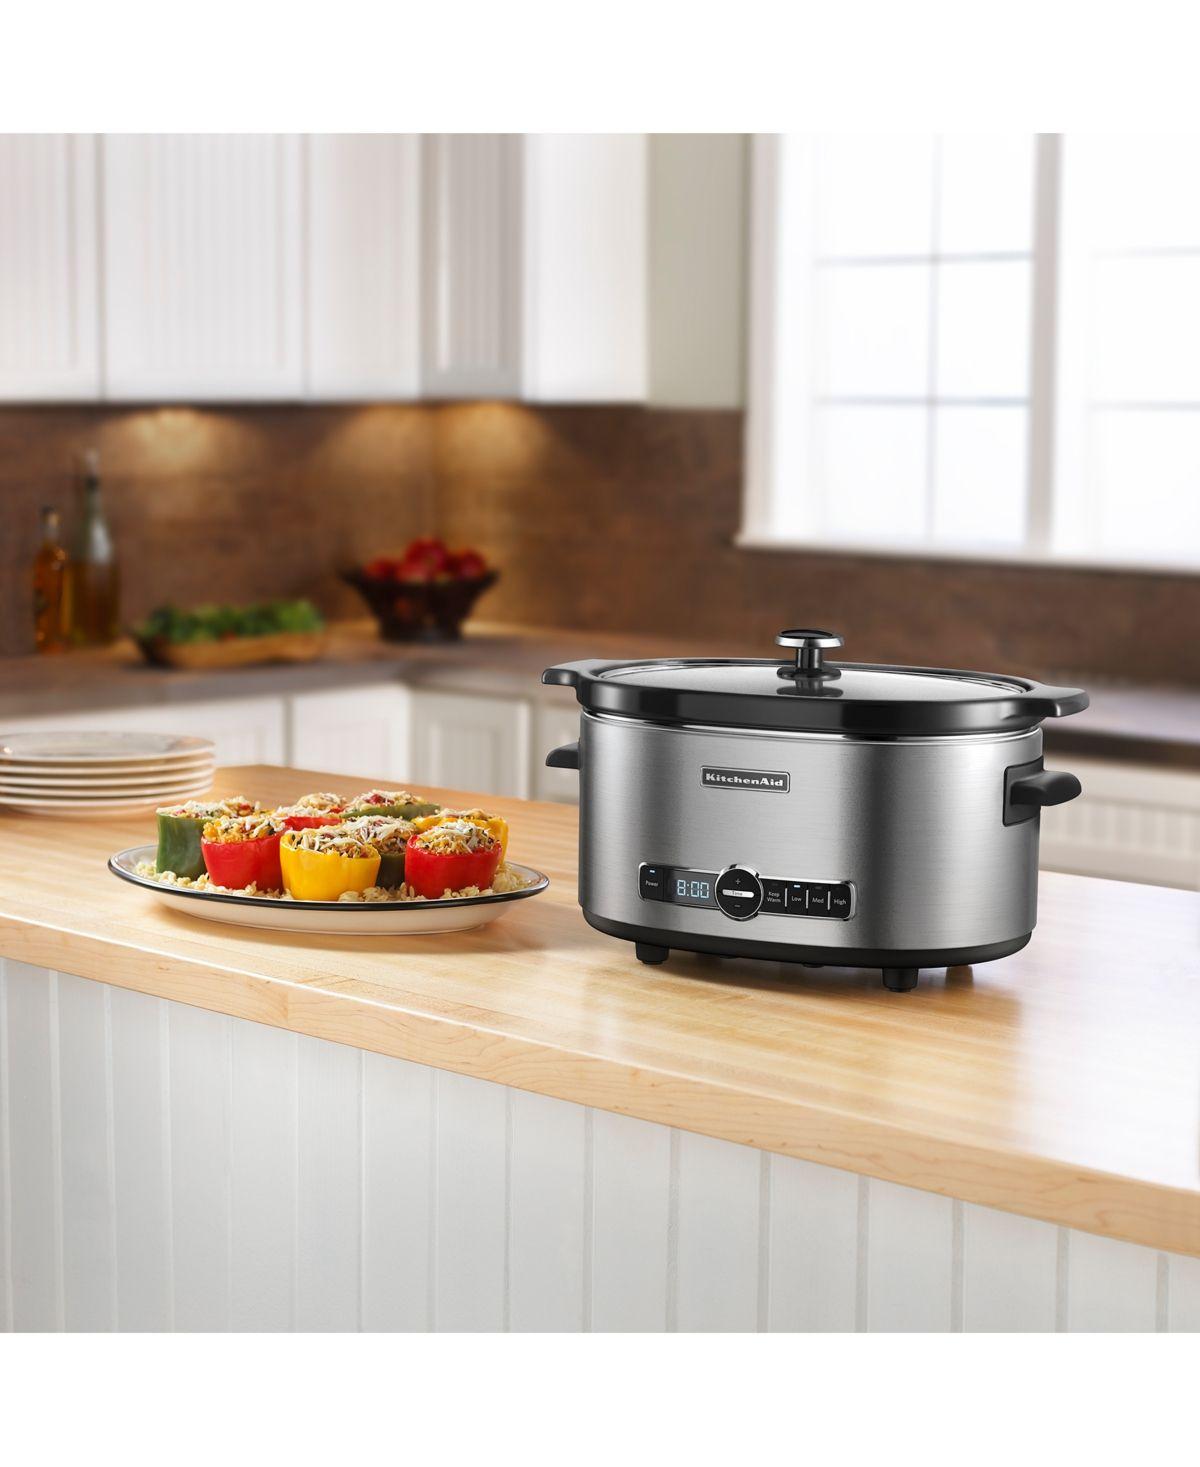 Kitchenaid 6 qt slow cooker ksc6223 reviews small